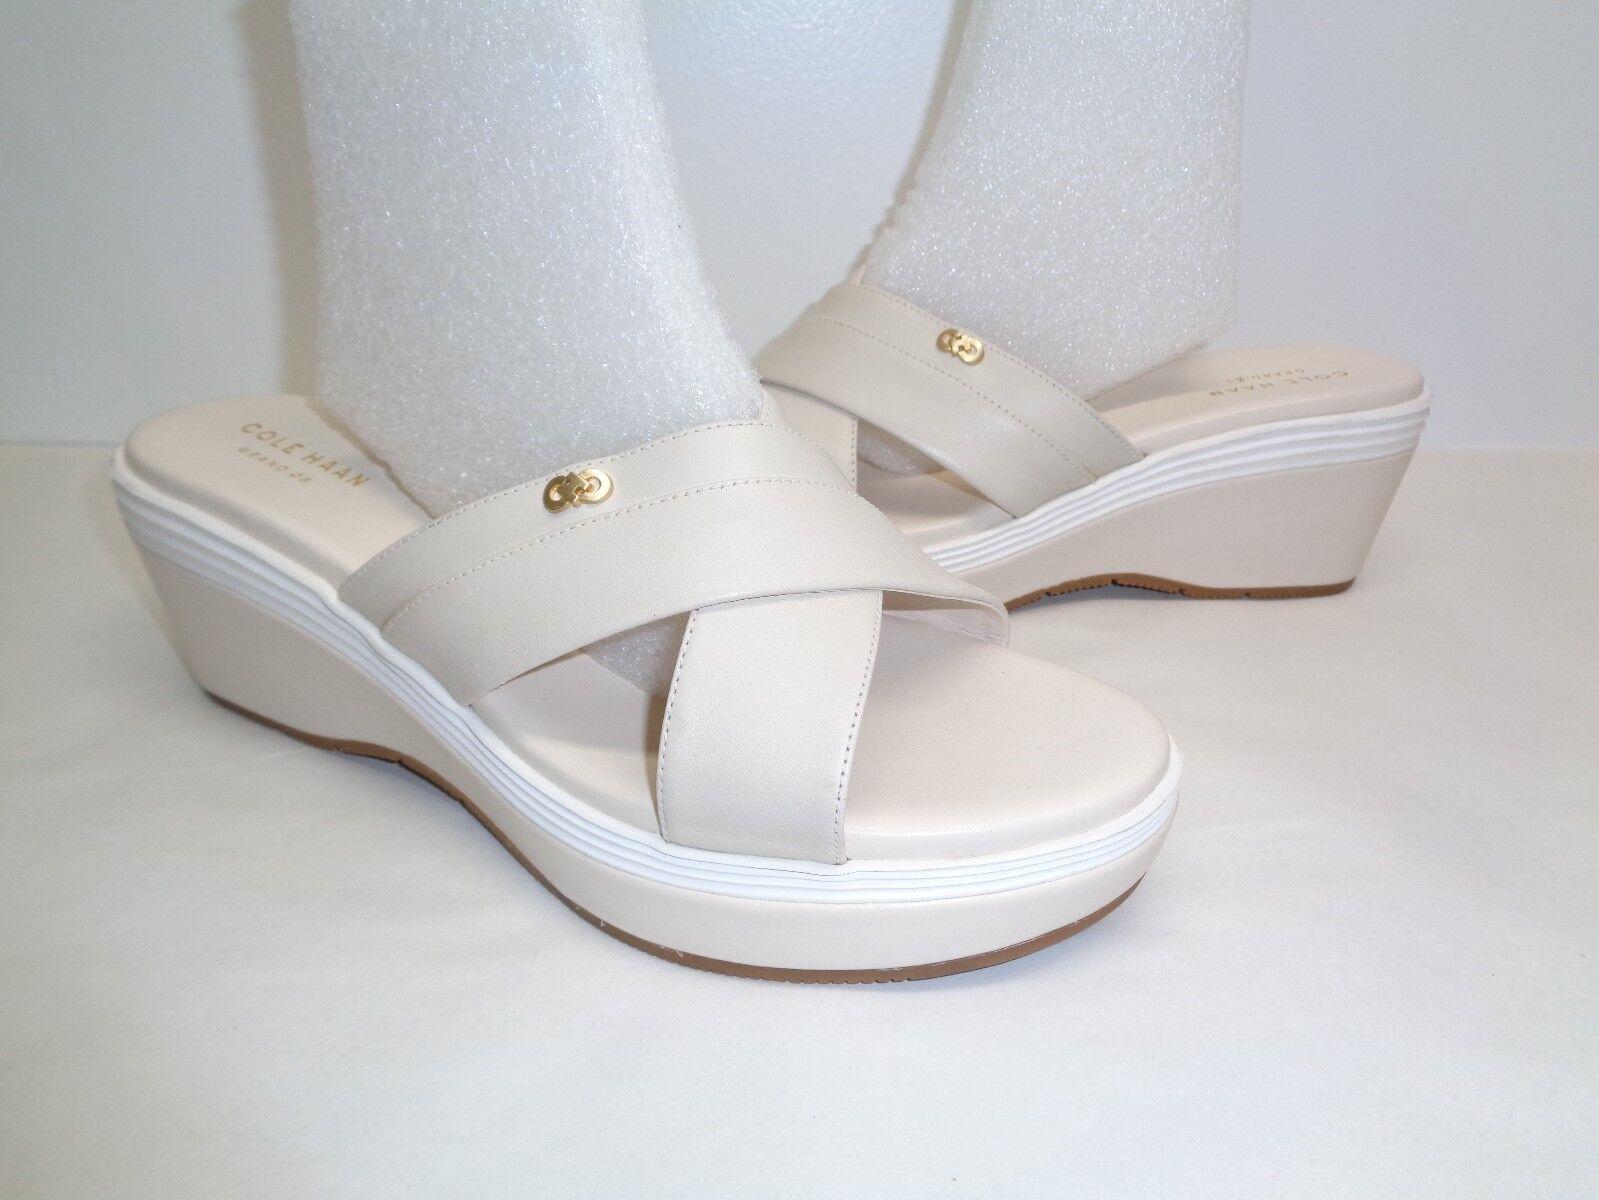 Cole Wedge Haan Größe 8.5 M BRIELLA GRAND Beige Leder Wedge Cole Sandales New Damenschuhe Schuhes b9bbb0